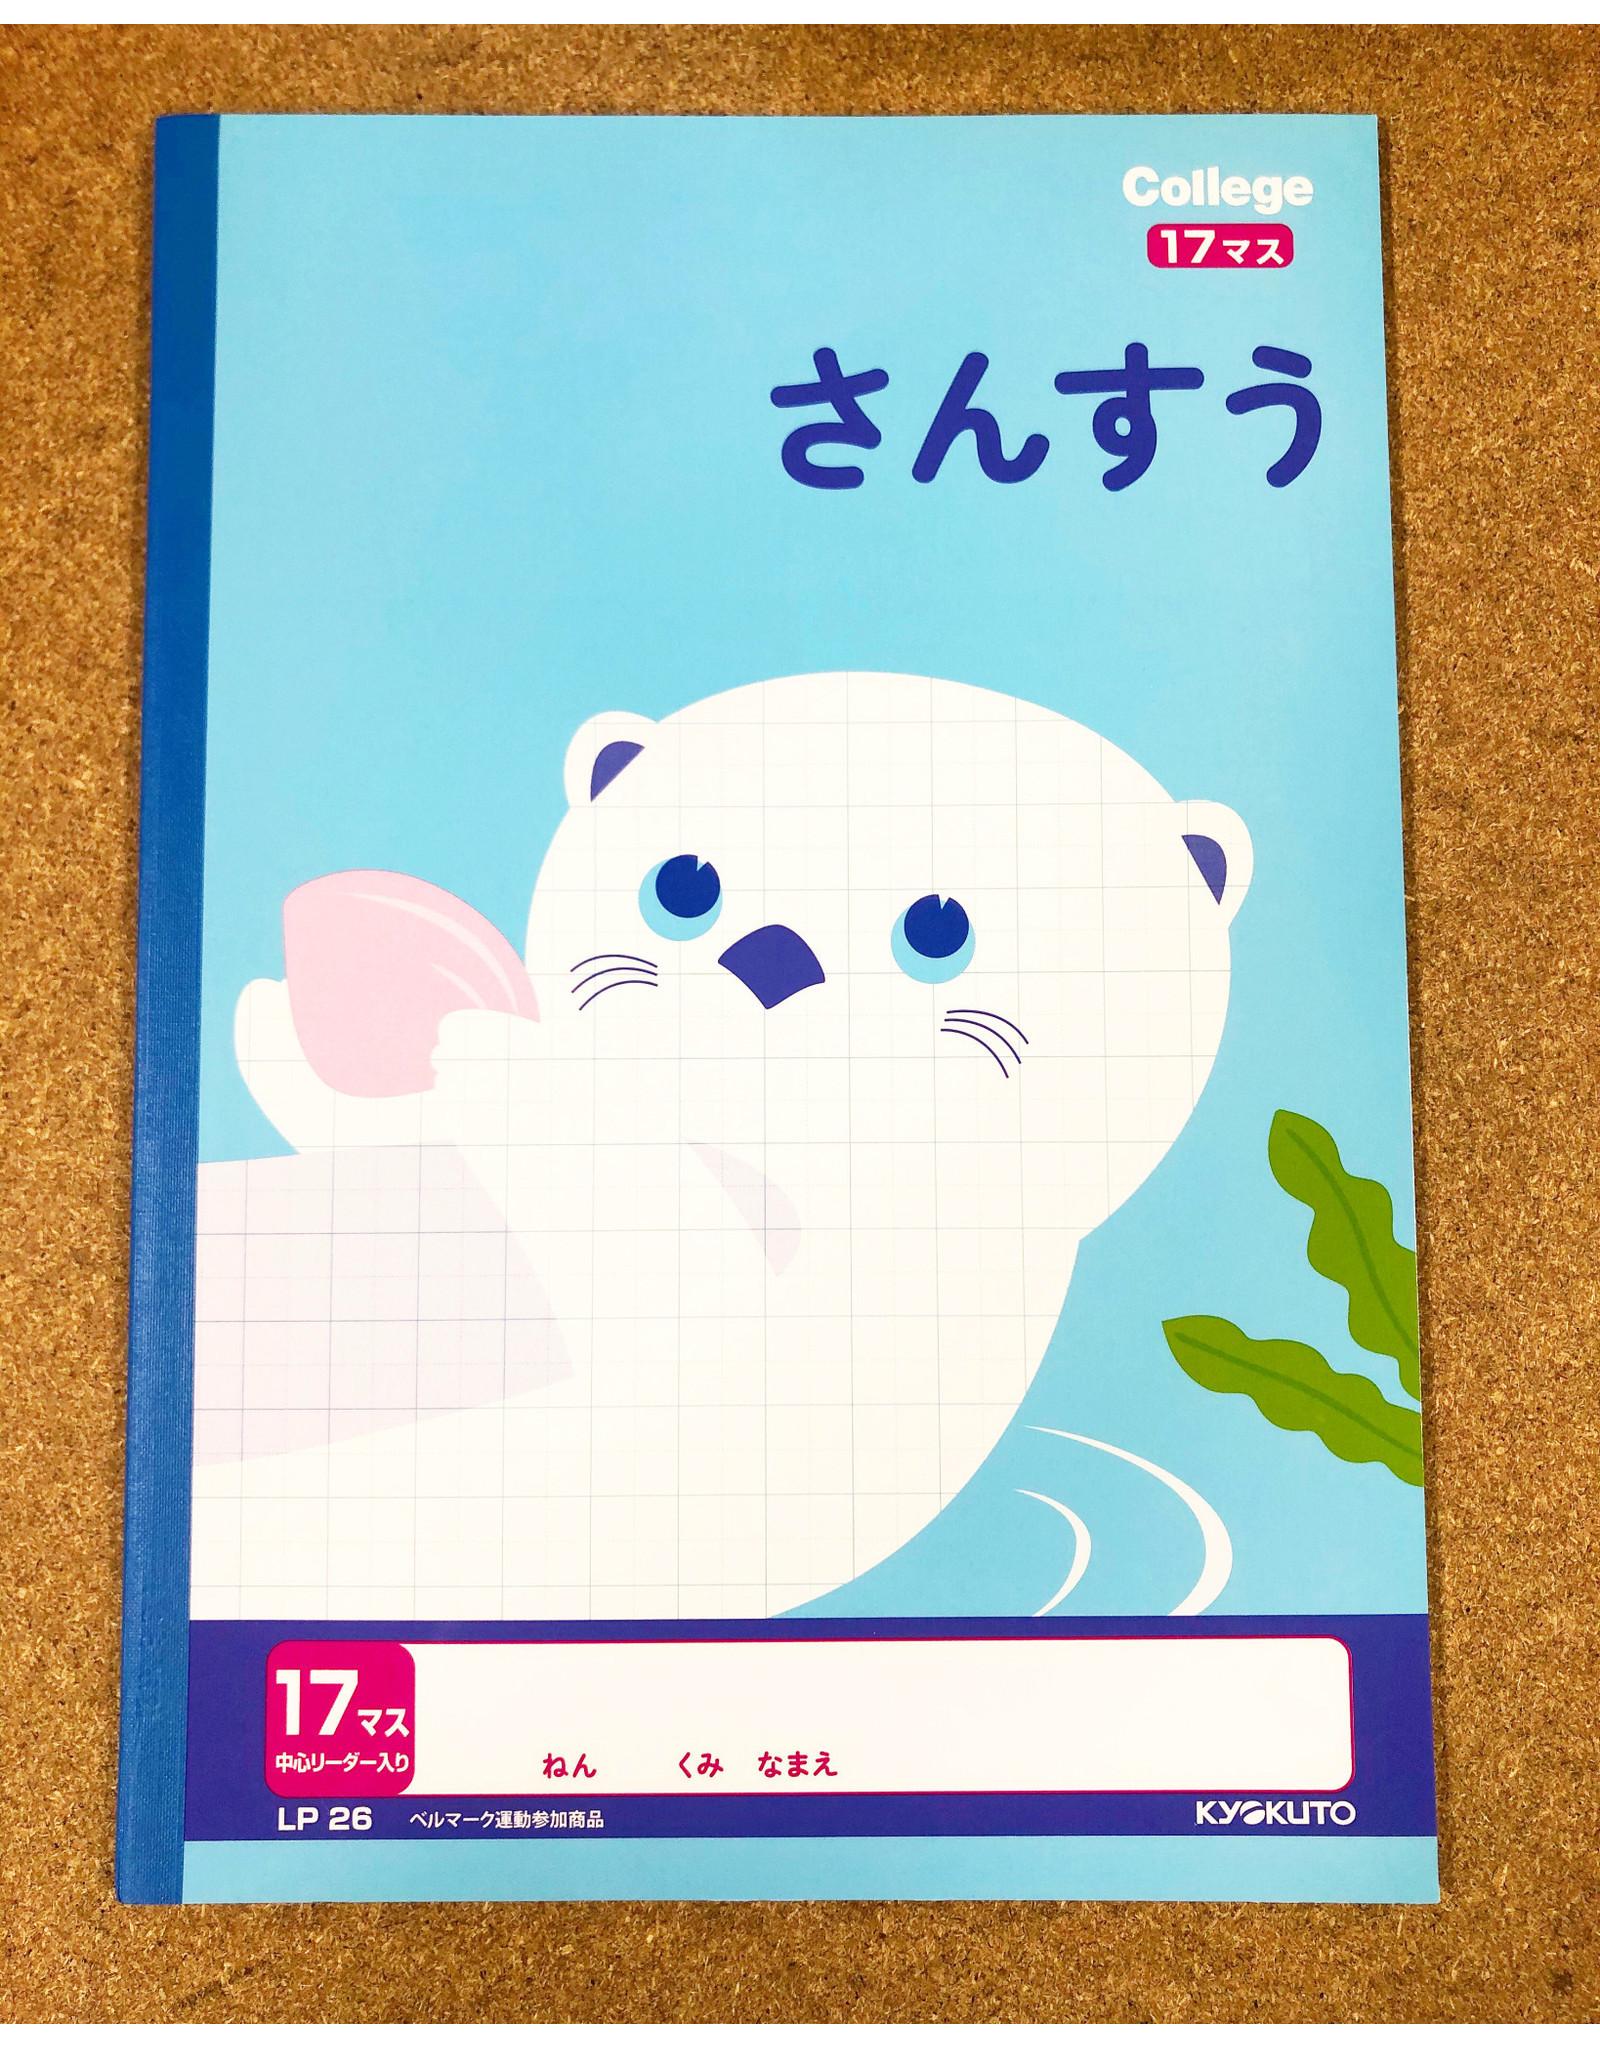 Kyokuto Associates co., ltd. SANSU NOTE - 17MASU WITH LEADER